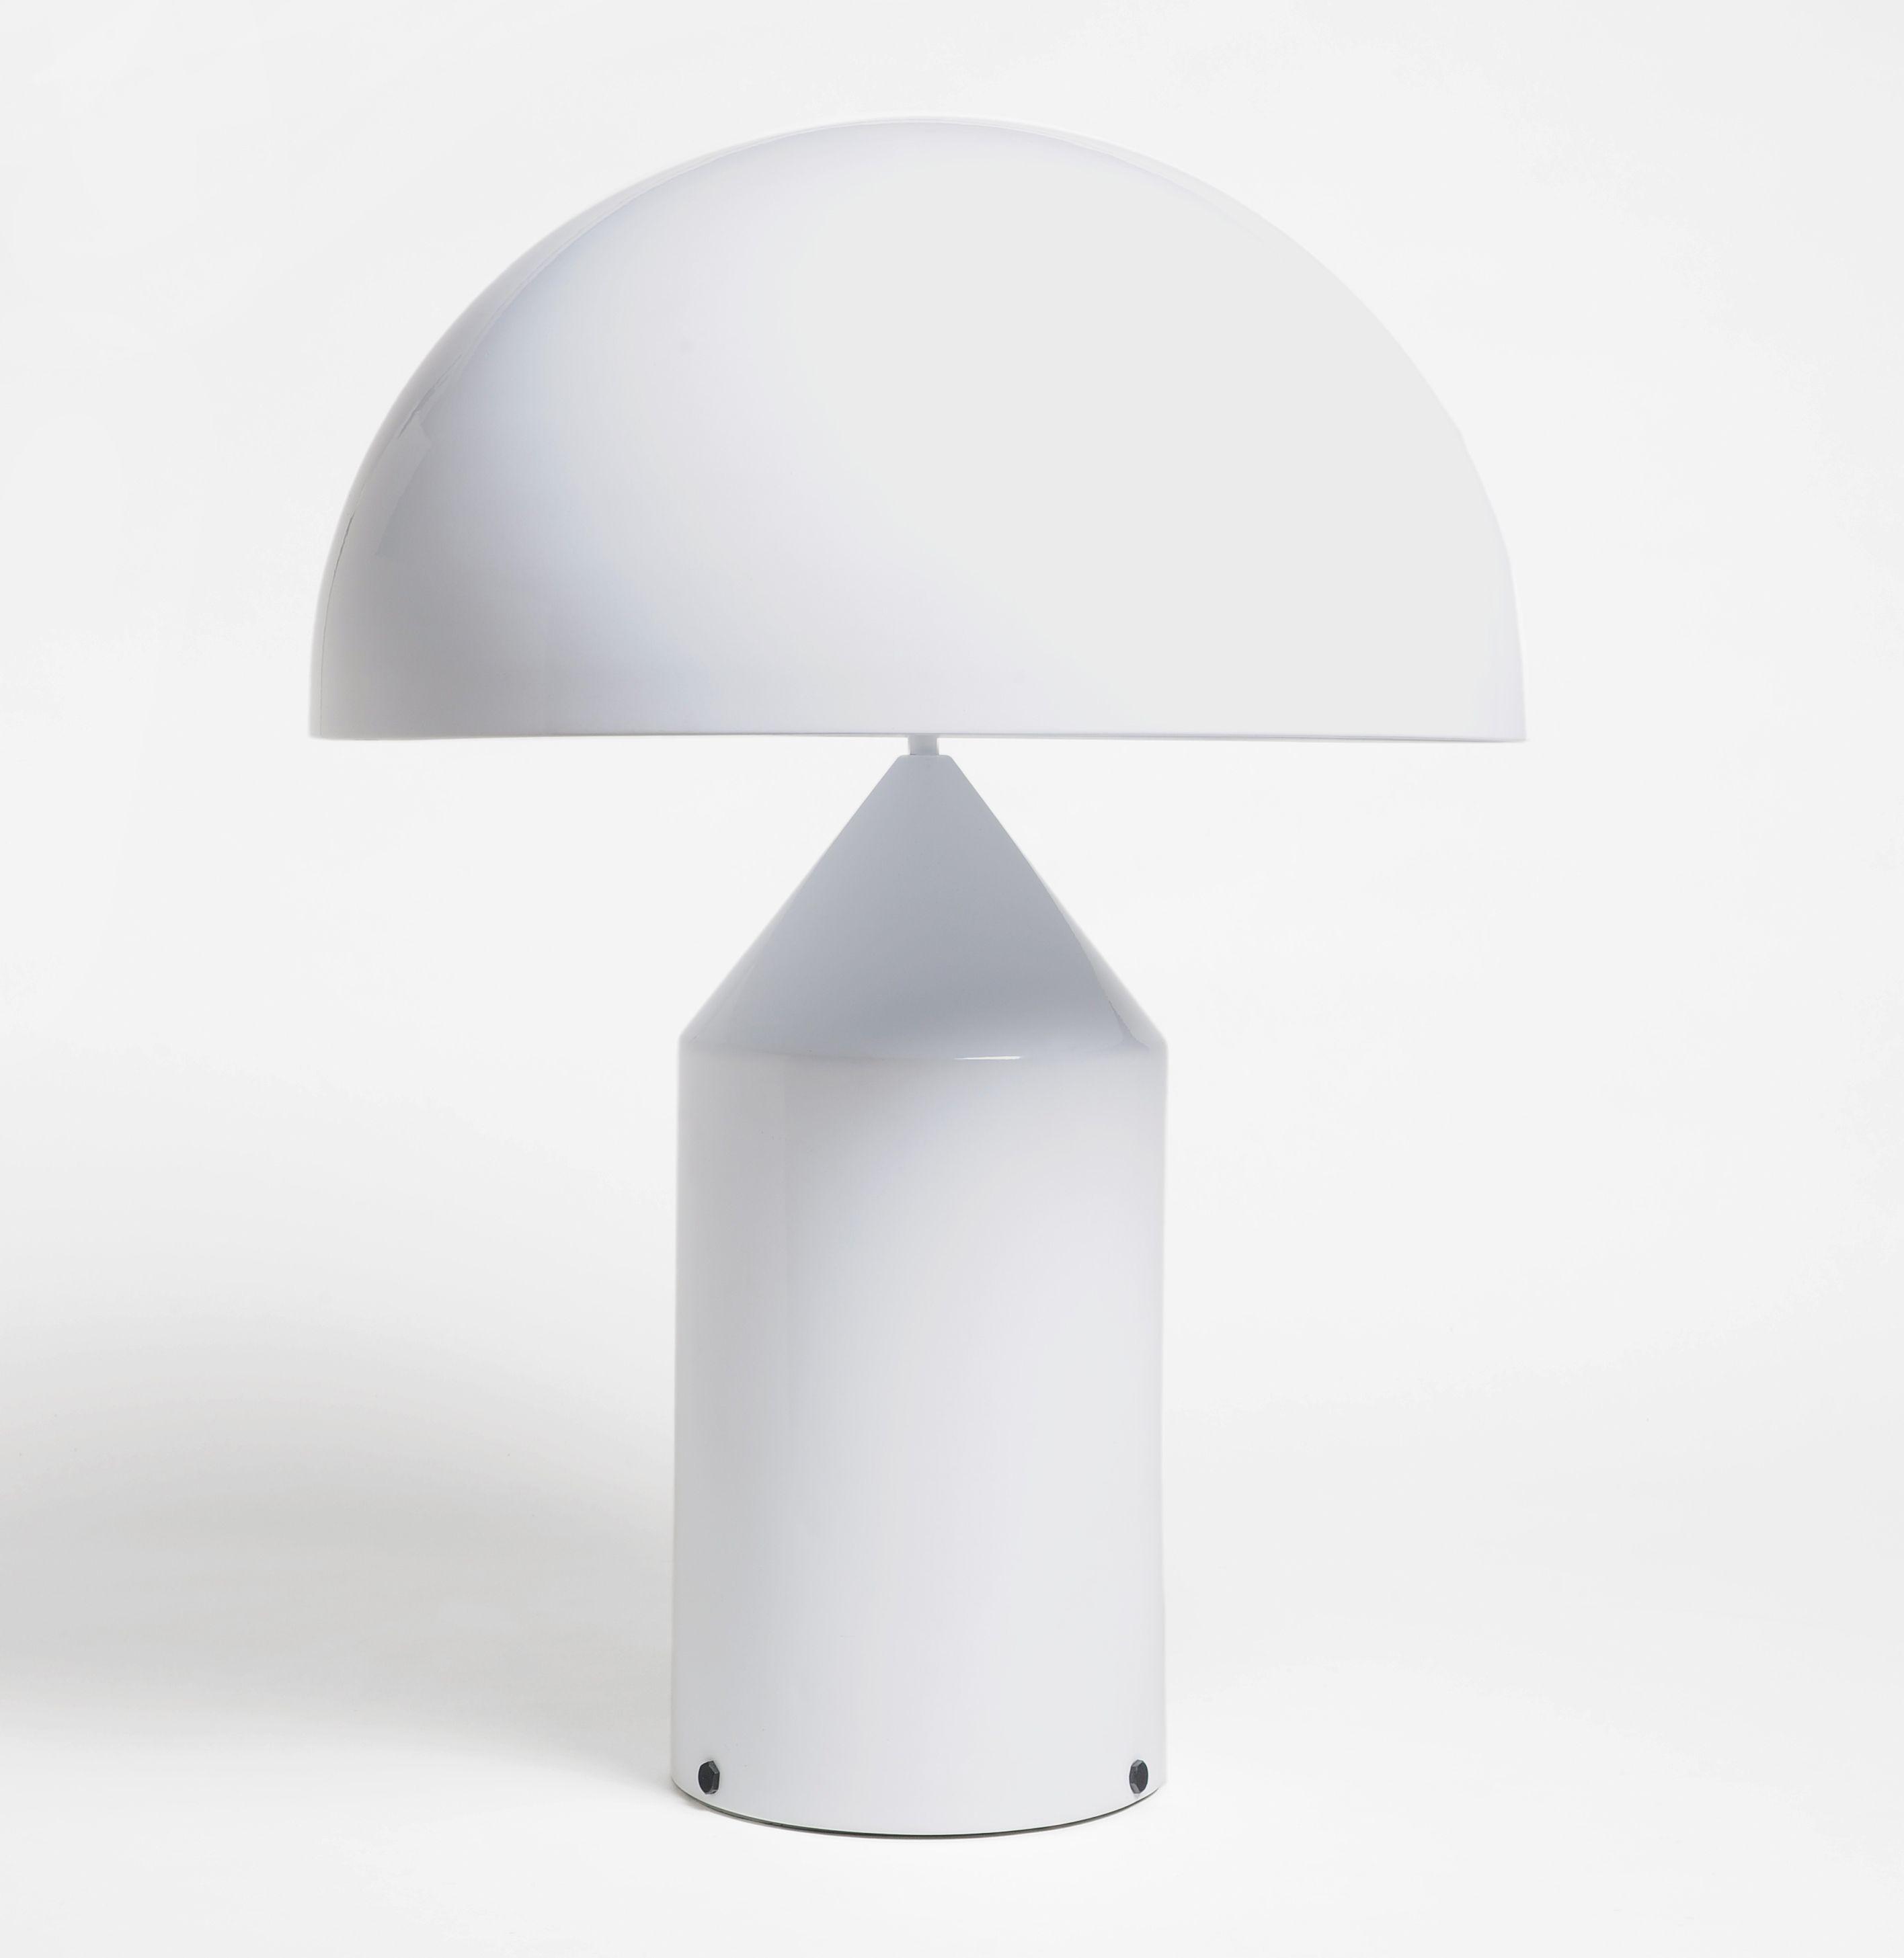 72009e5b8d873250aea6ce6c36871d8f Résultat Supérieur 60 Luxe Lampe Decorative Stock 2018 Ldkt